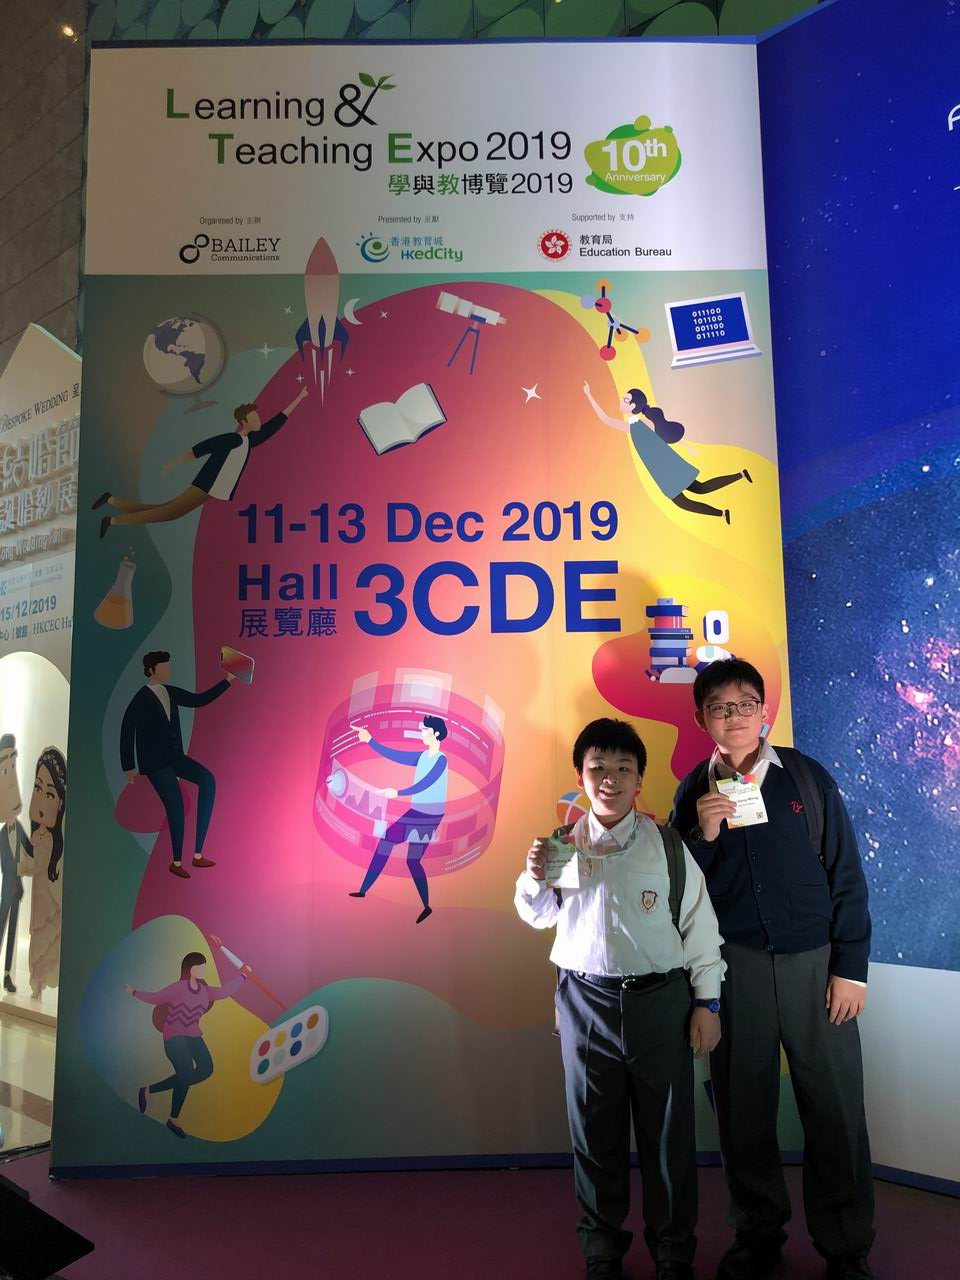 https://plkcjy.edu.hk/sites/default/files/xuan_zhuan_img_6063.jpg